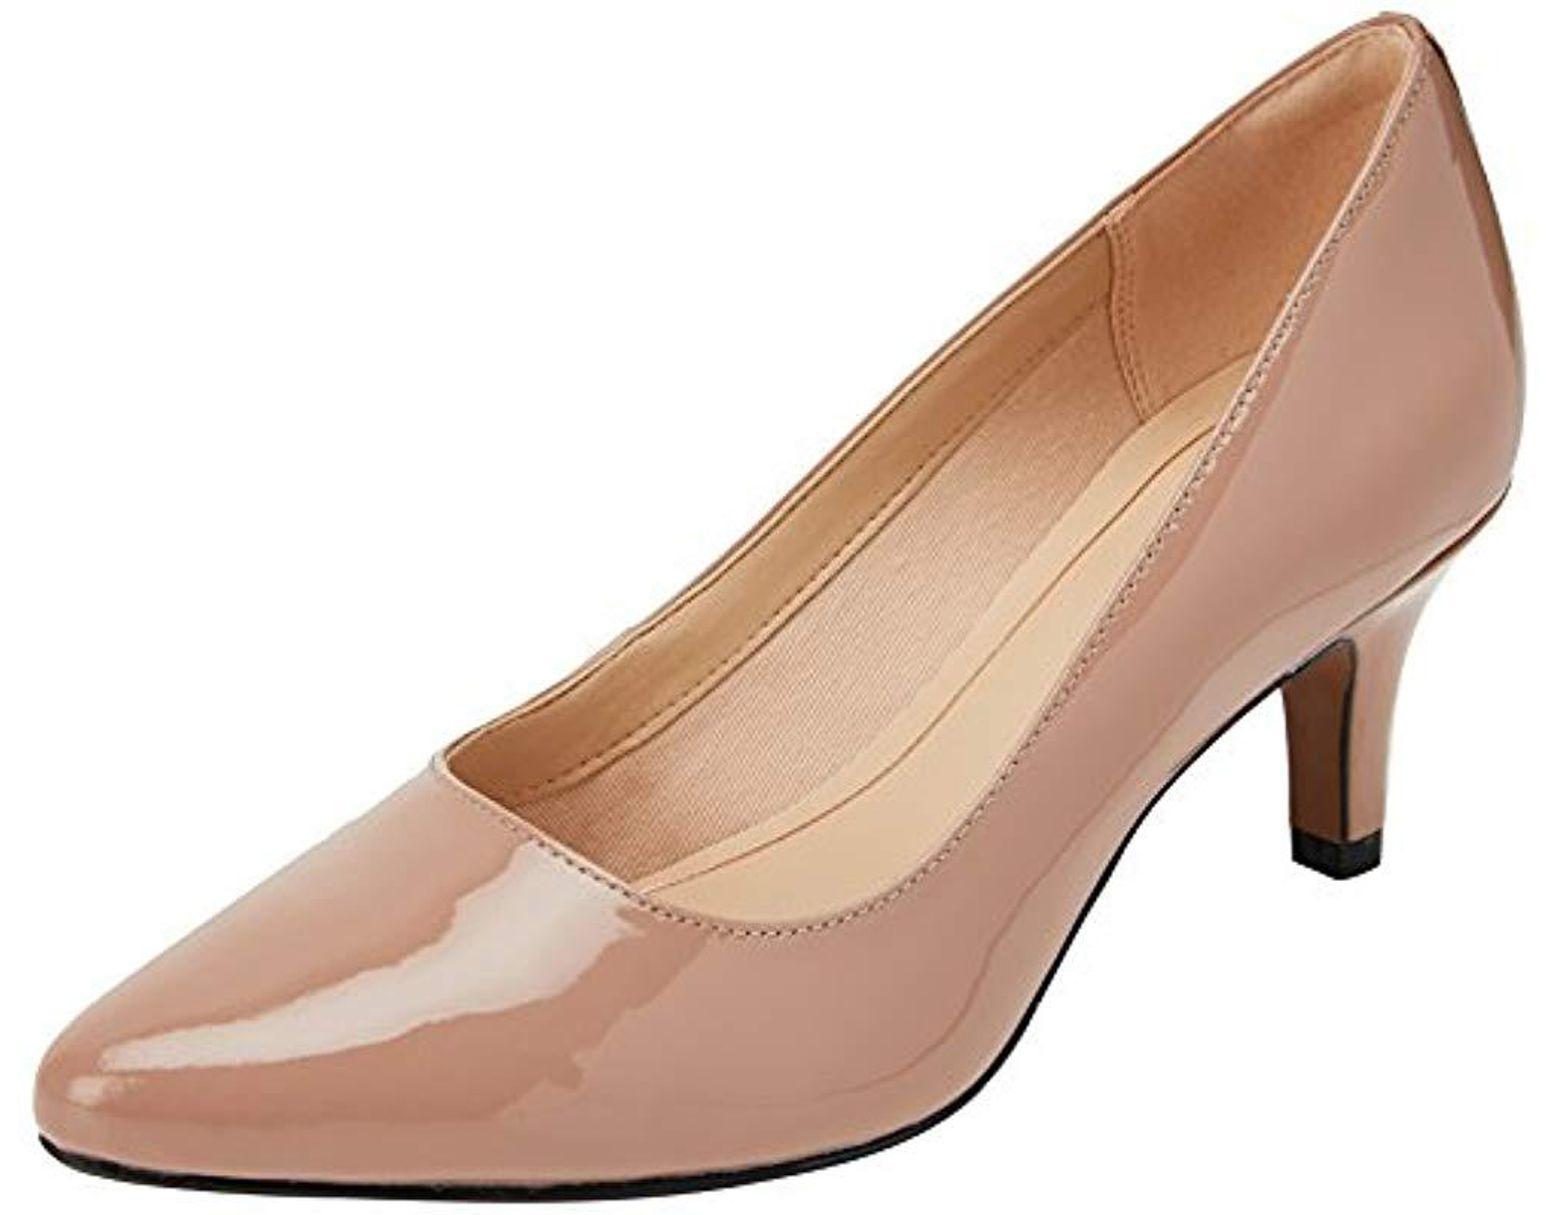 f1ceb1c7c77 Women's Natural Isidora Faye Closed Toe Heels